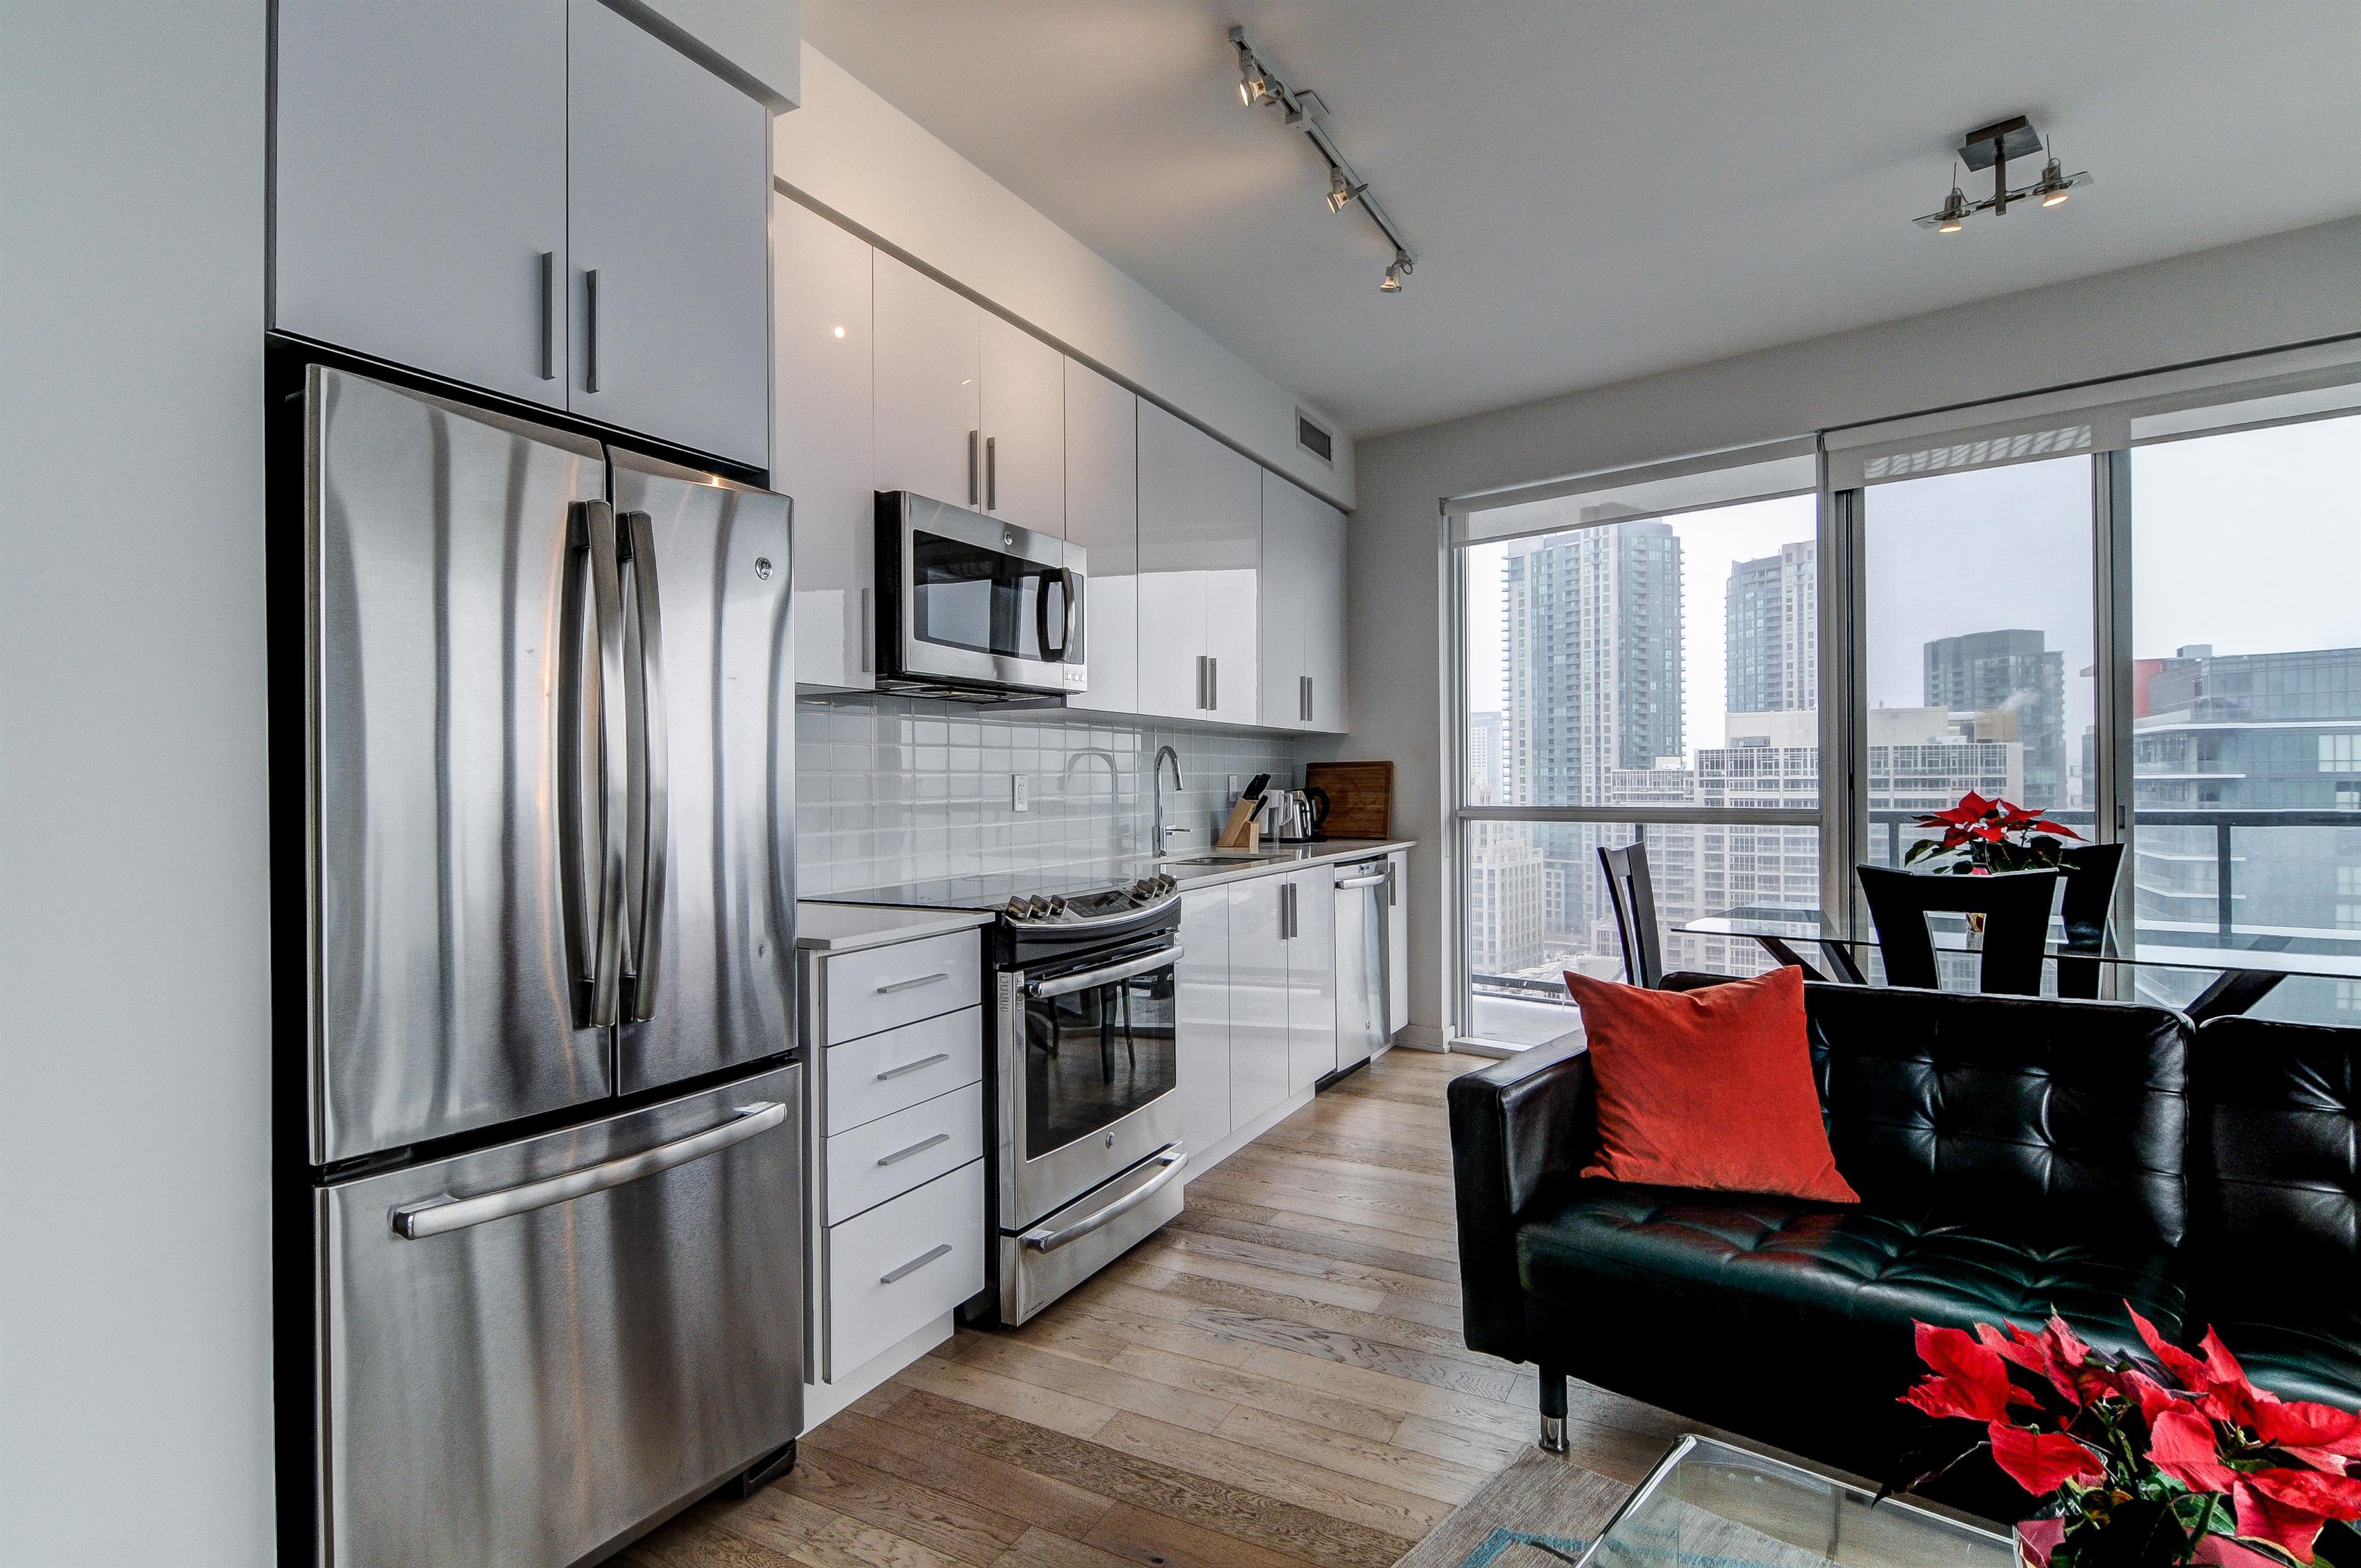 Rent Furnished Toronto - Fully furnished executive 2 ...